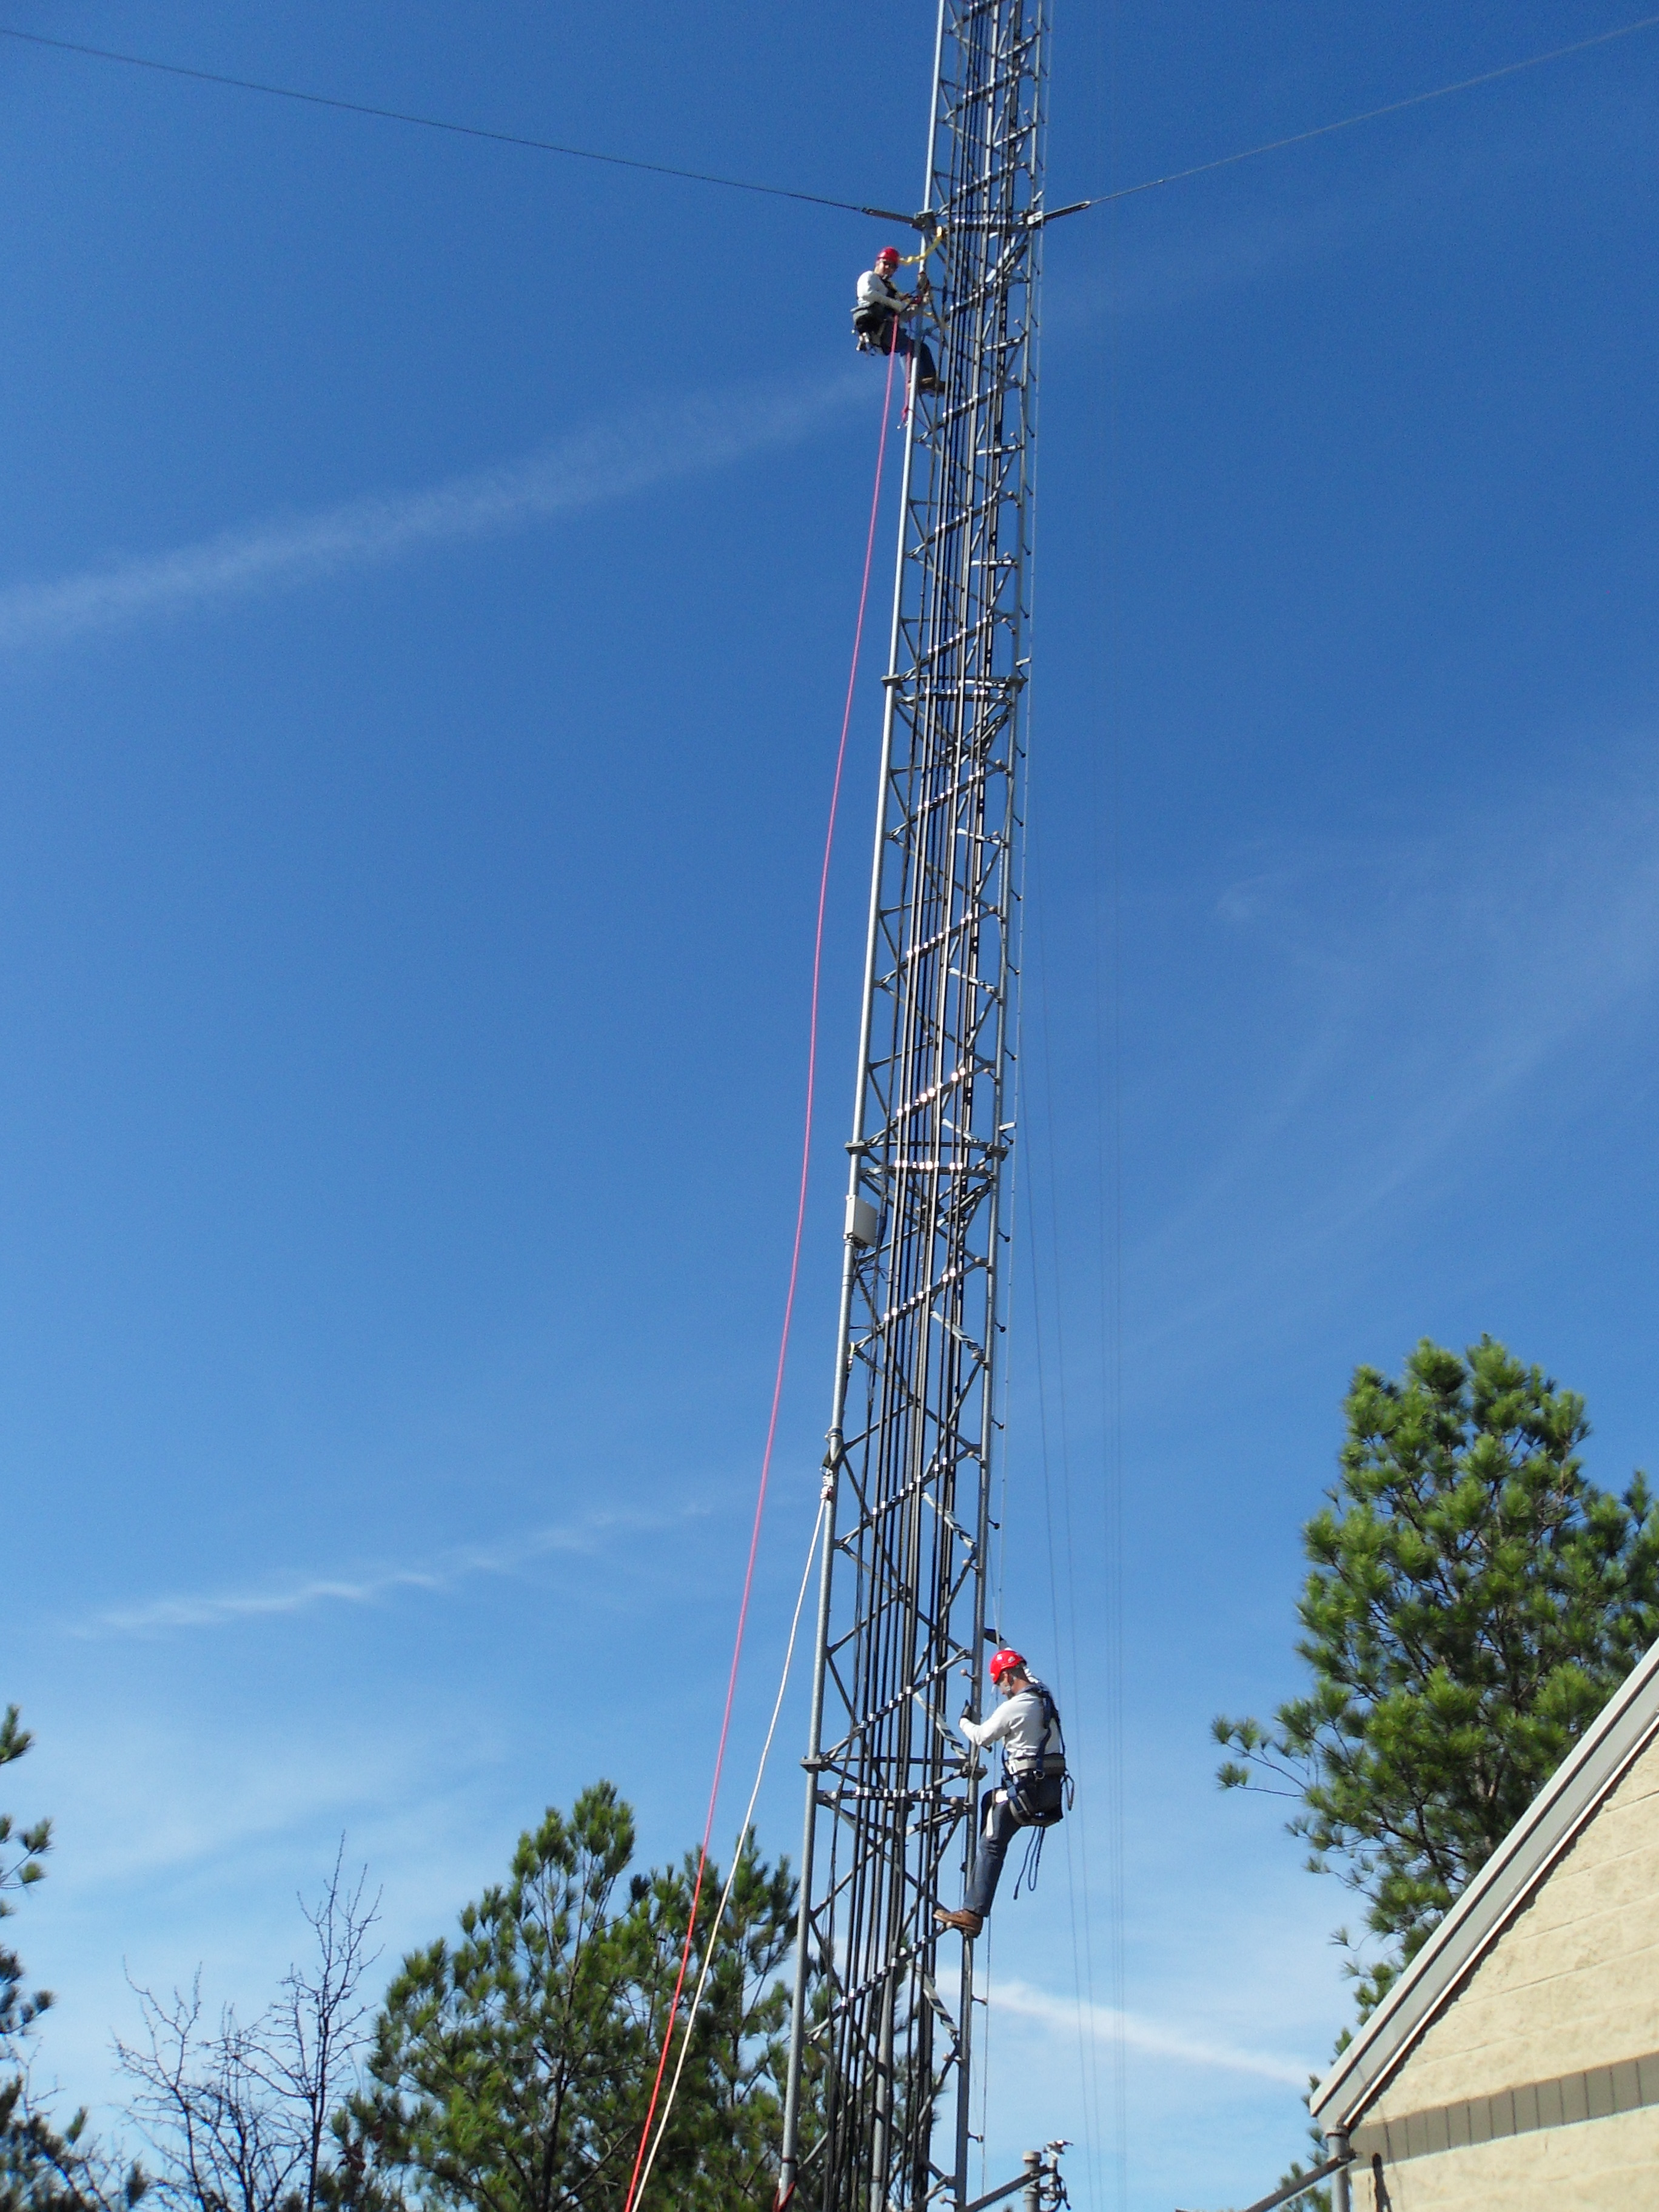 OSHA RFI Questions for Tower Climbers